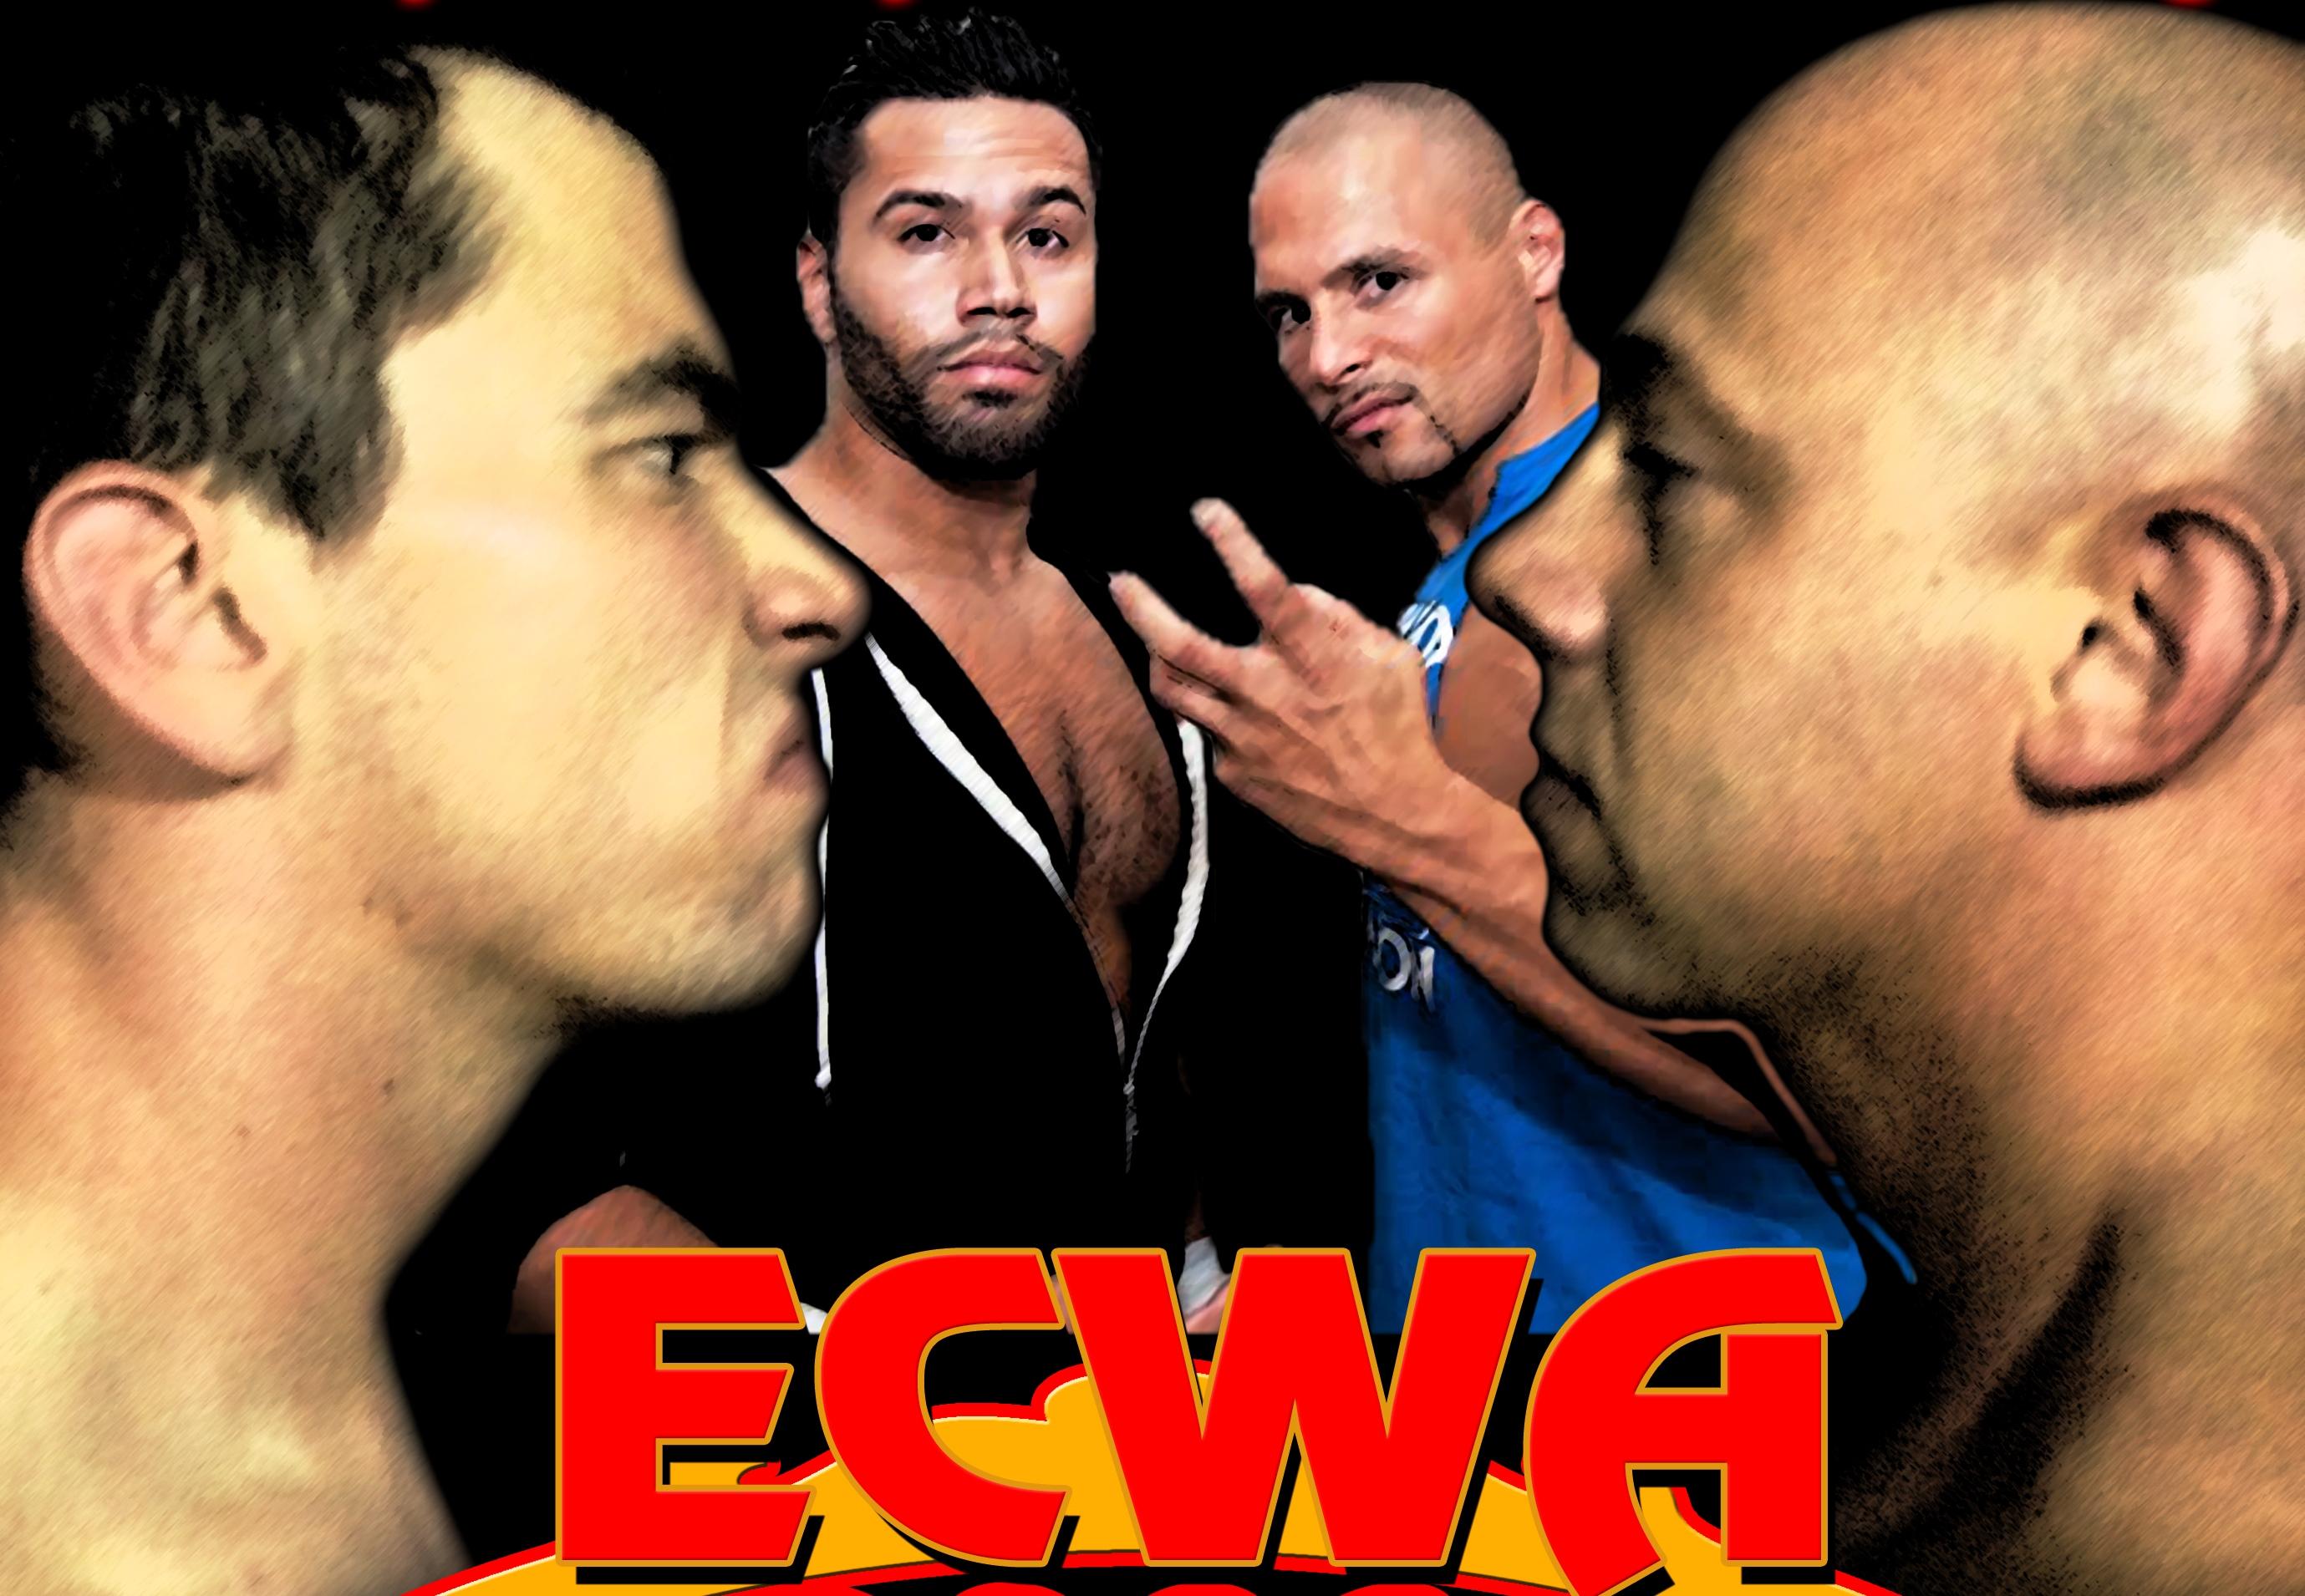 ECWA 2